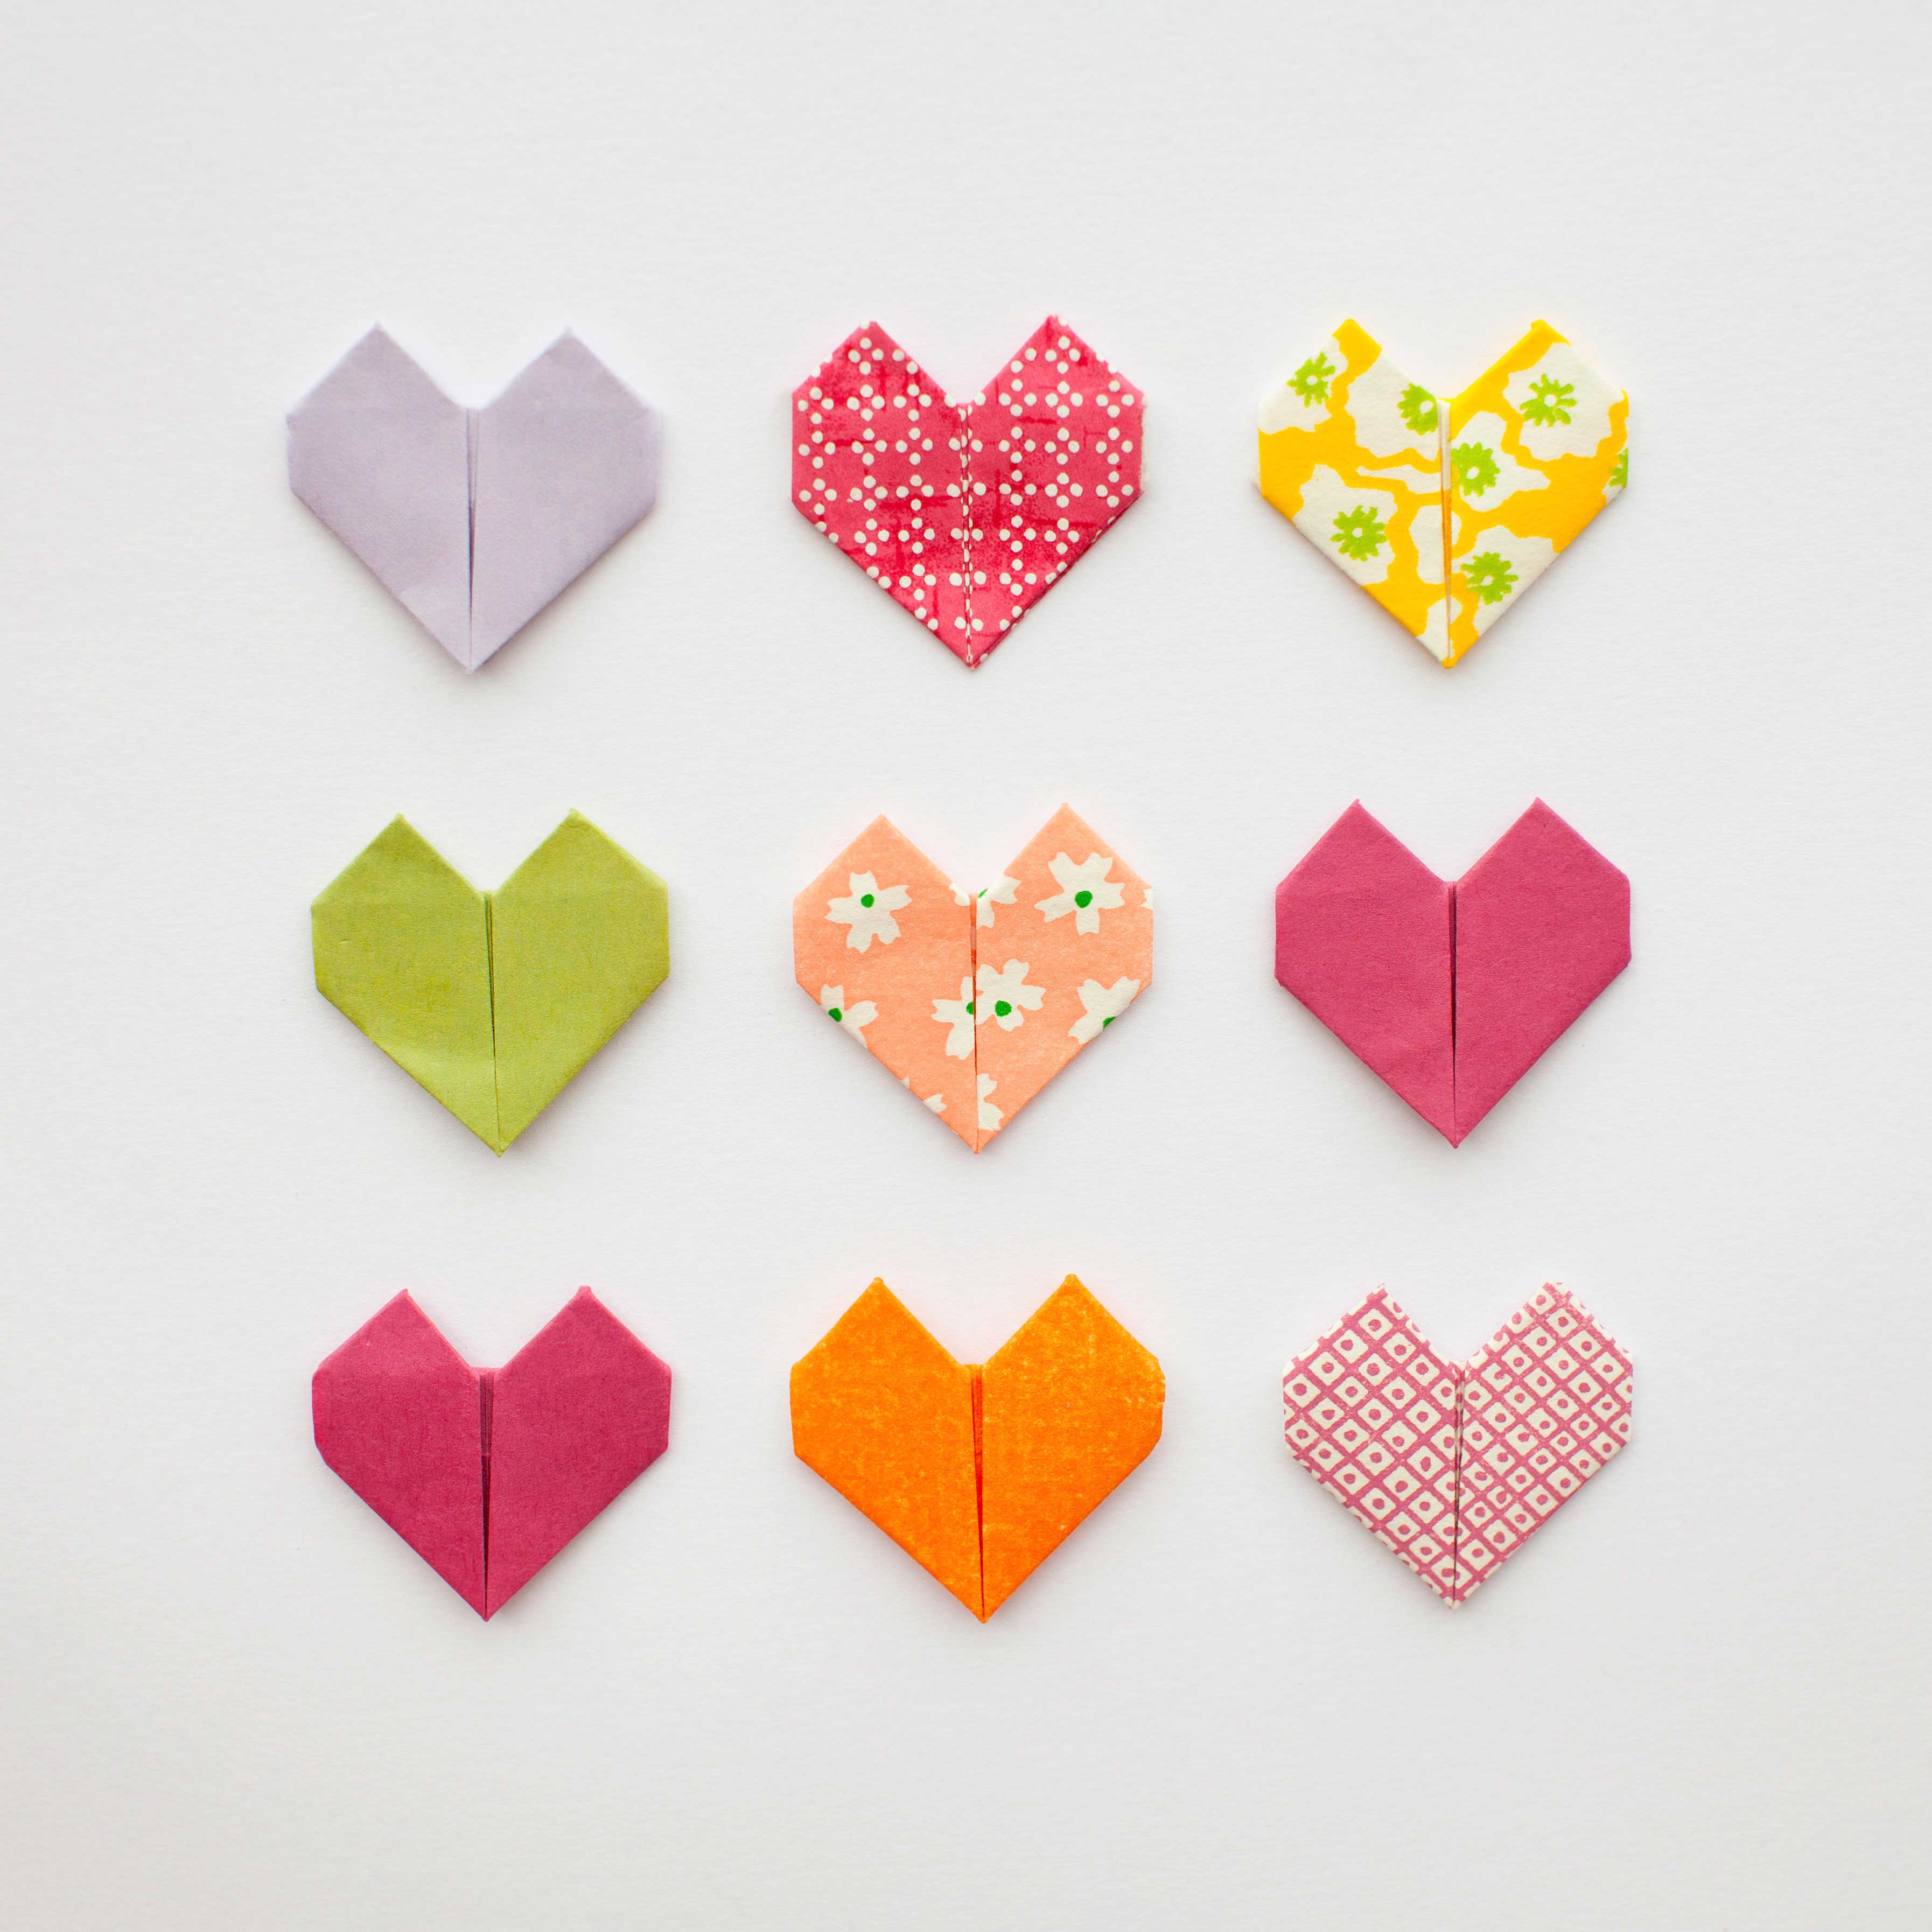 Origami hearts for Valentine's Day - LivingMiVidaLoca.com